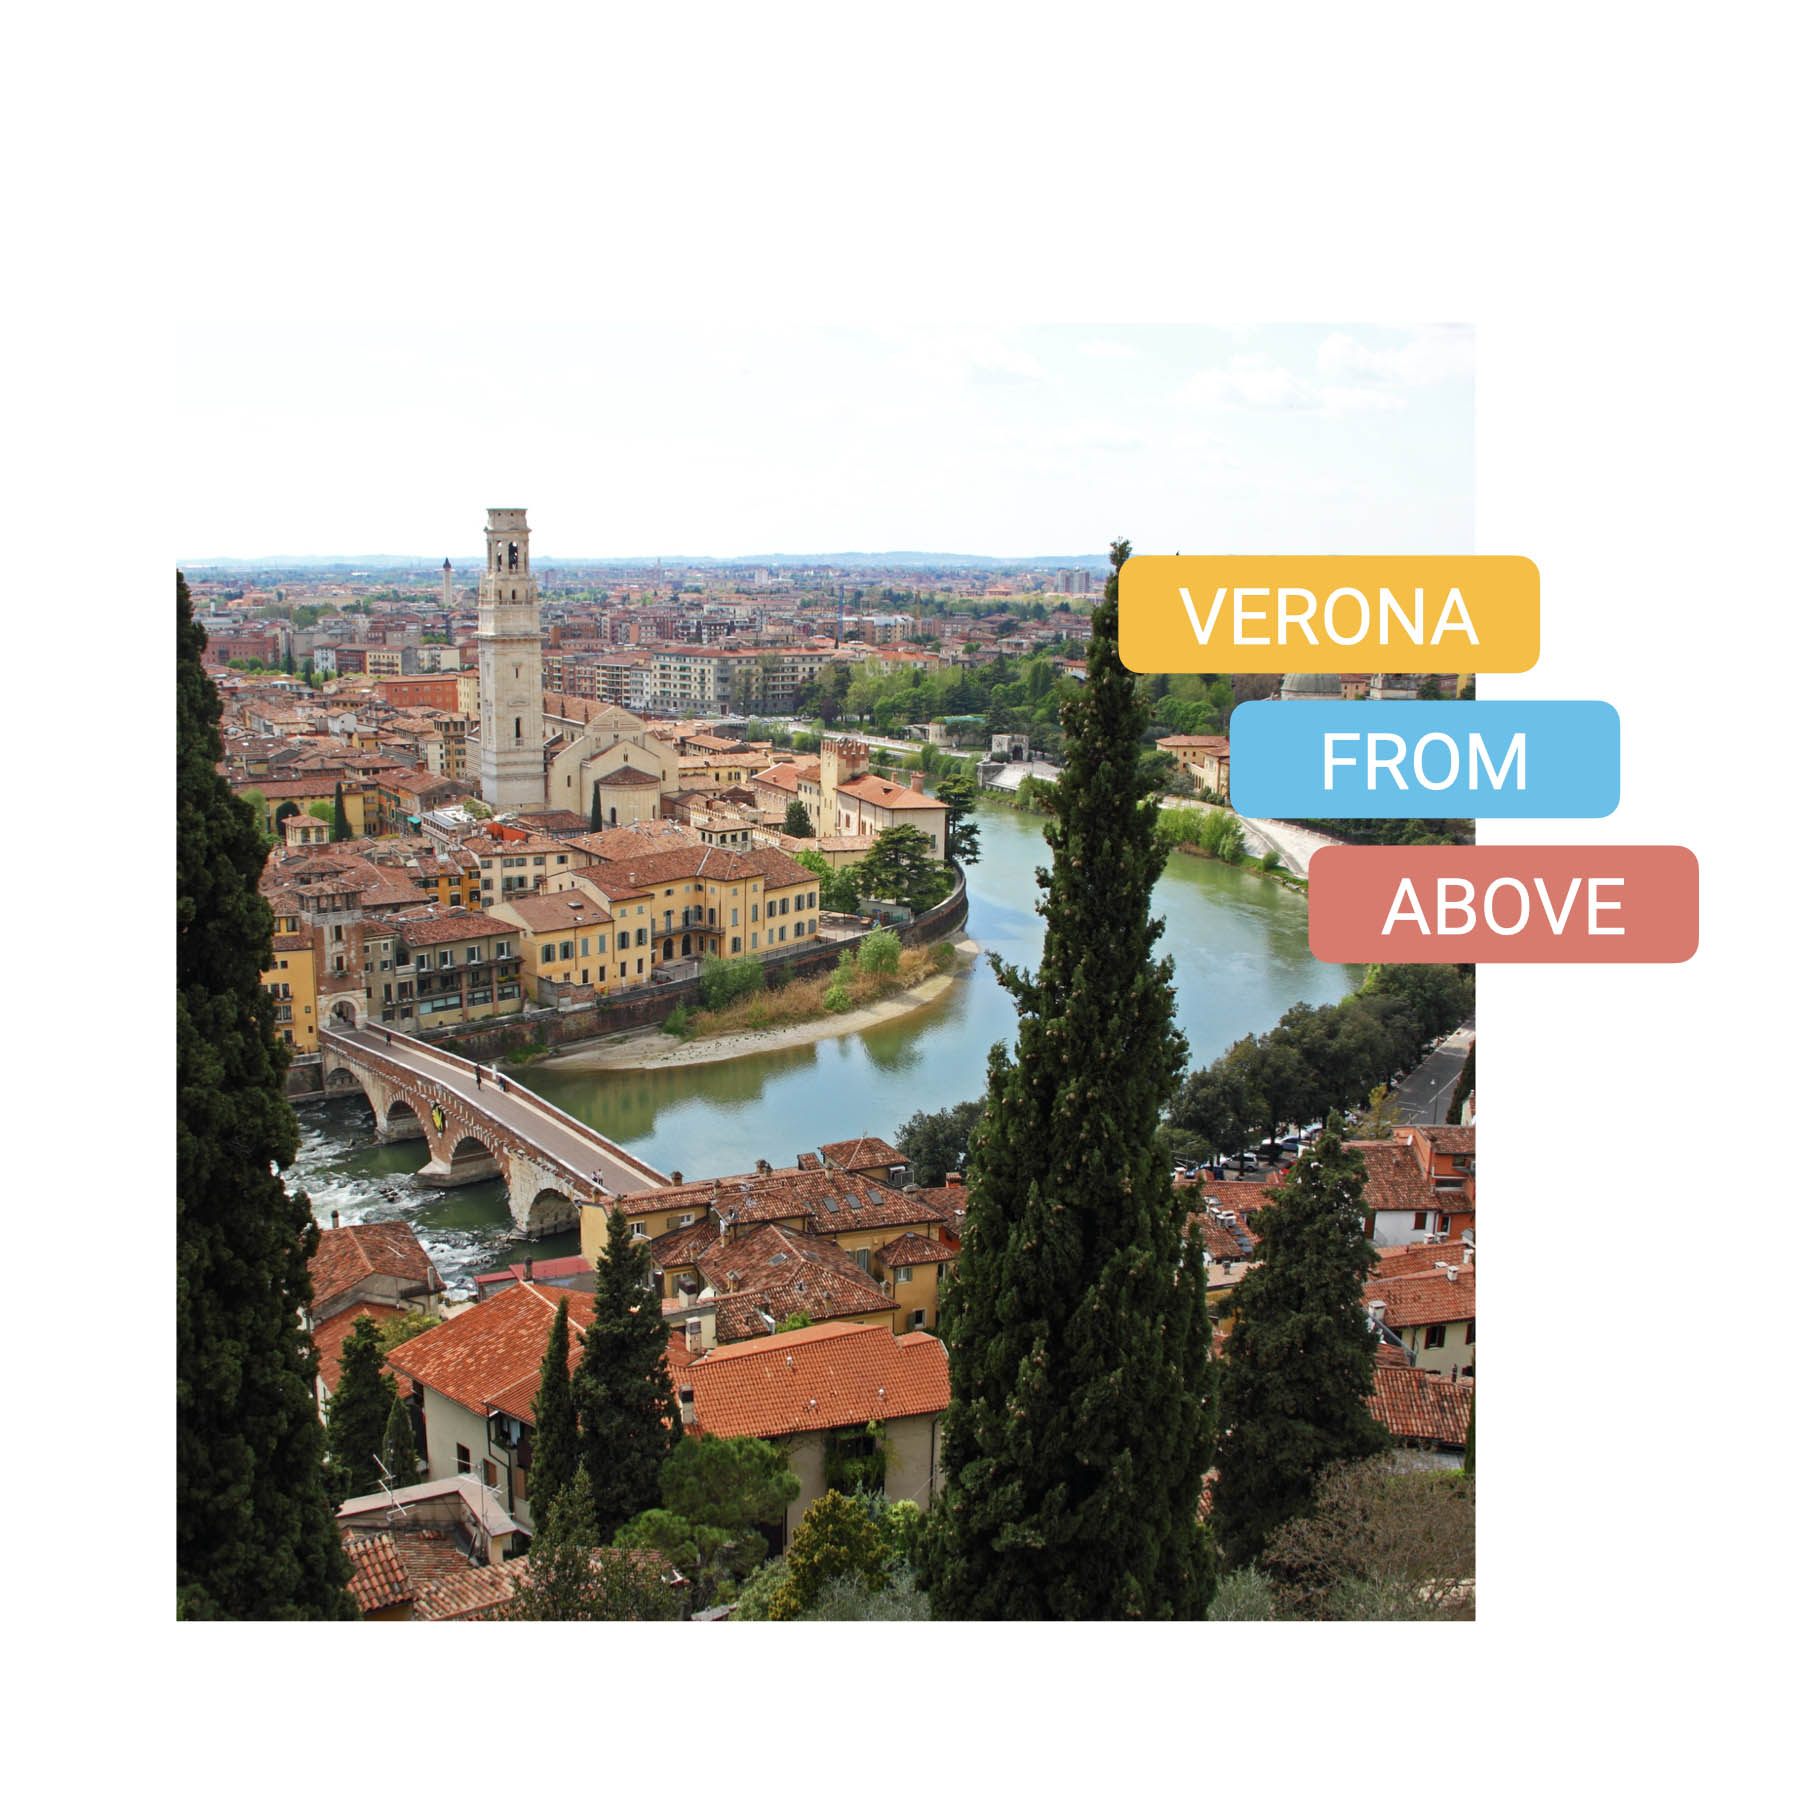 best view of verona - bike tour verona from above